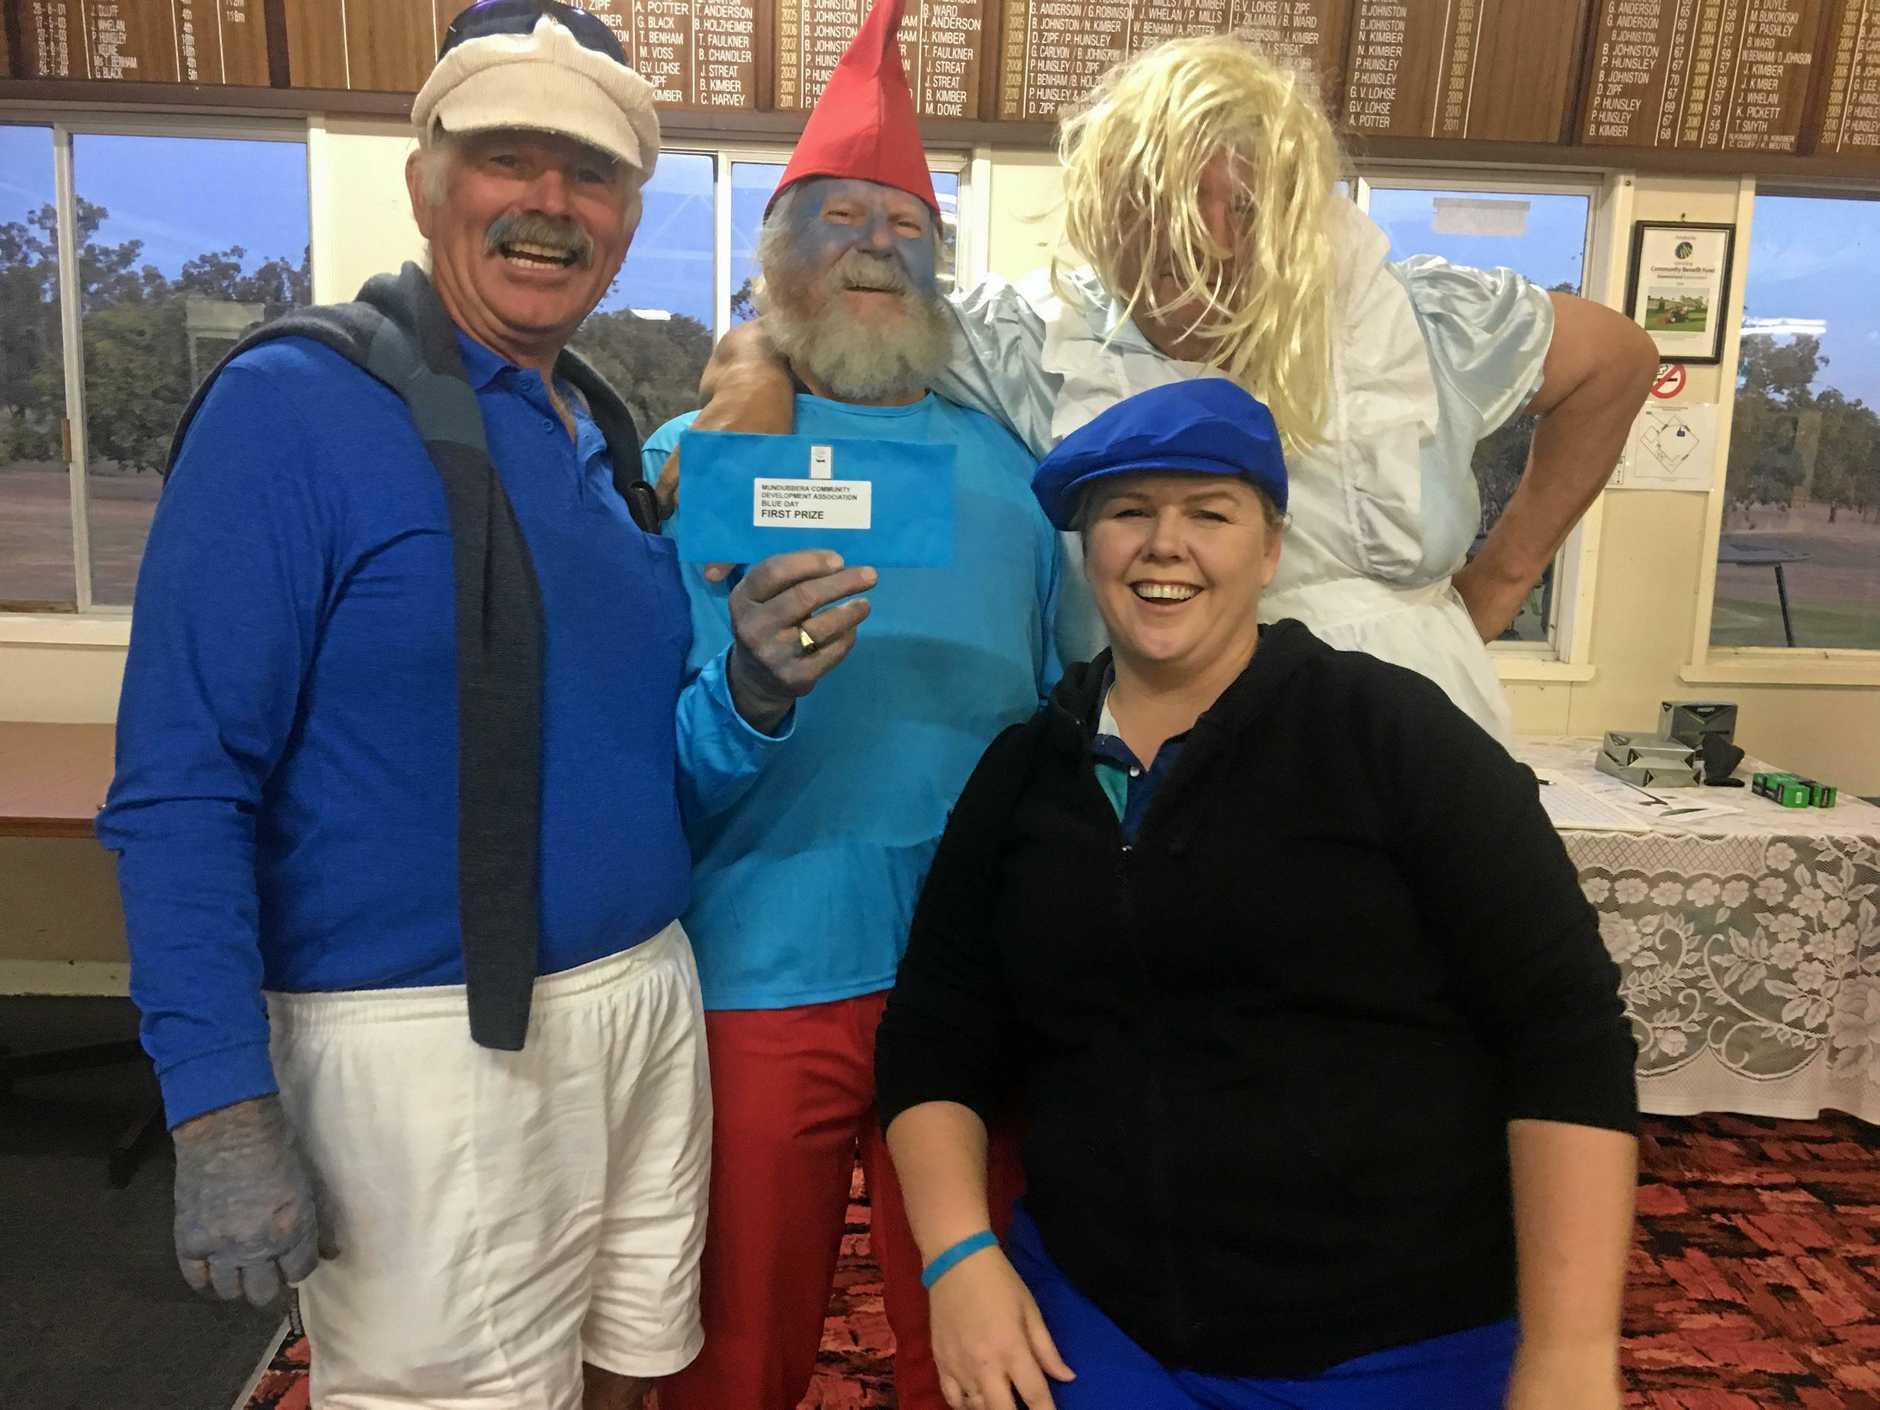 Ian Maskovich, Garnet Keune, Louie Zipf and Bobby-Leigh Redgard at the MCDA golf day.